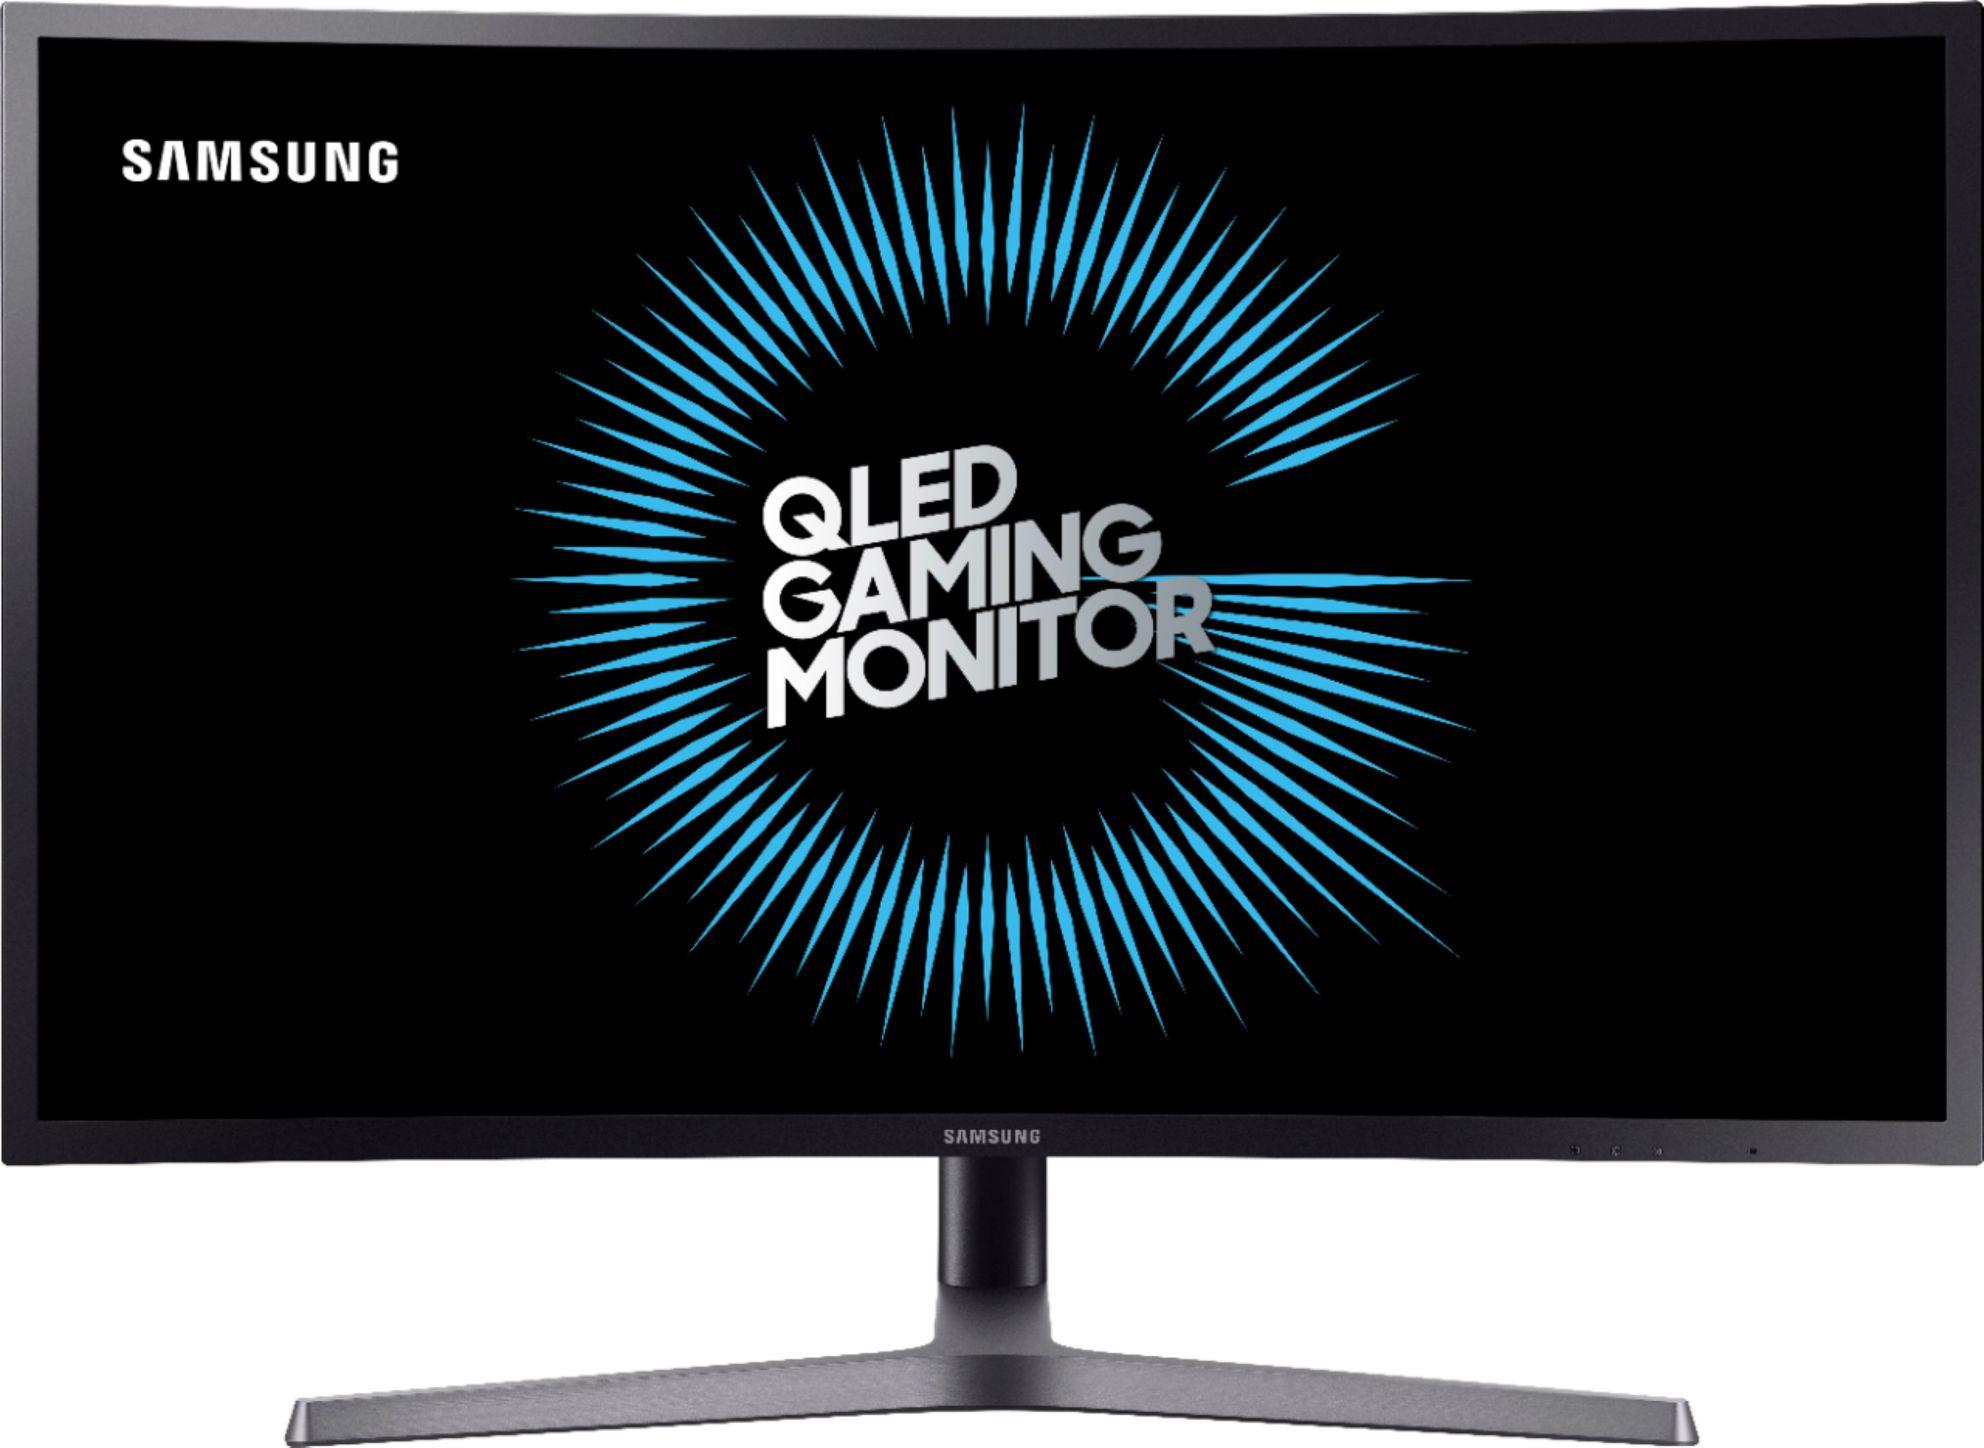 "Samsung C27HG70 Curved Gaming-Monitor 27"" WQHD, VA, FreeSync 2, HDR600, 350cd/m², 125% sRGB, Quantom-Dot, 1ms, Pivot, USB-Hub"